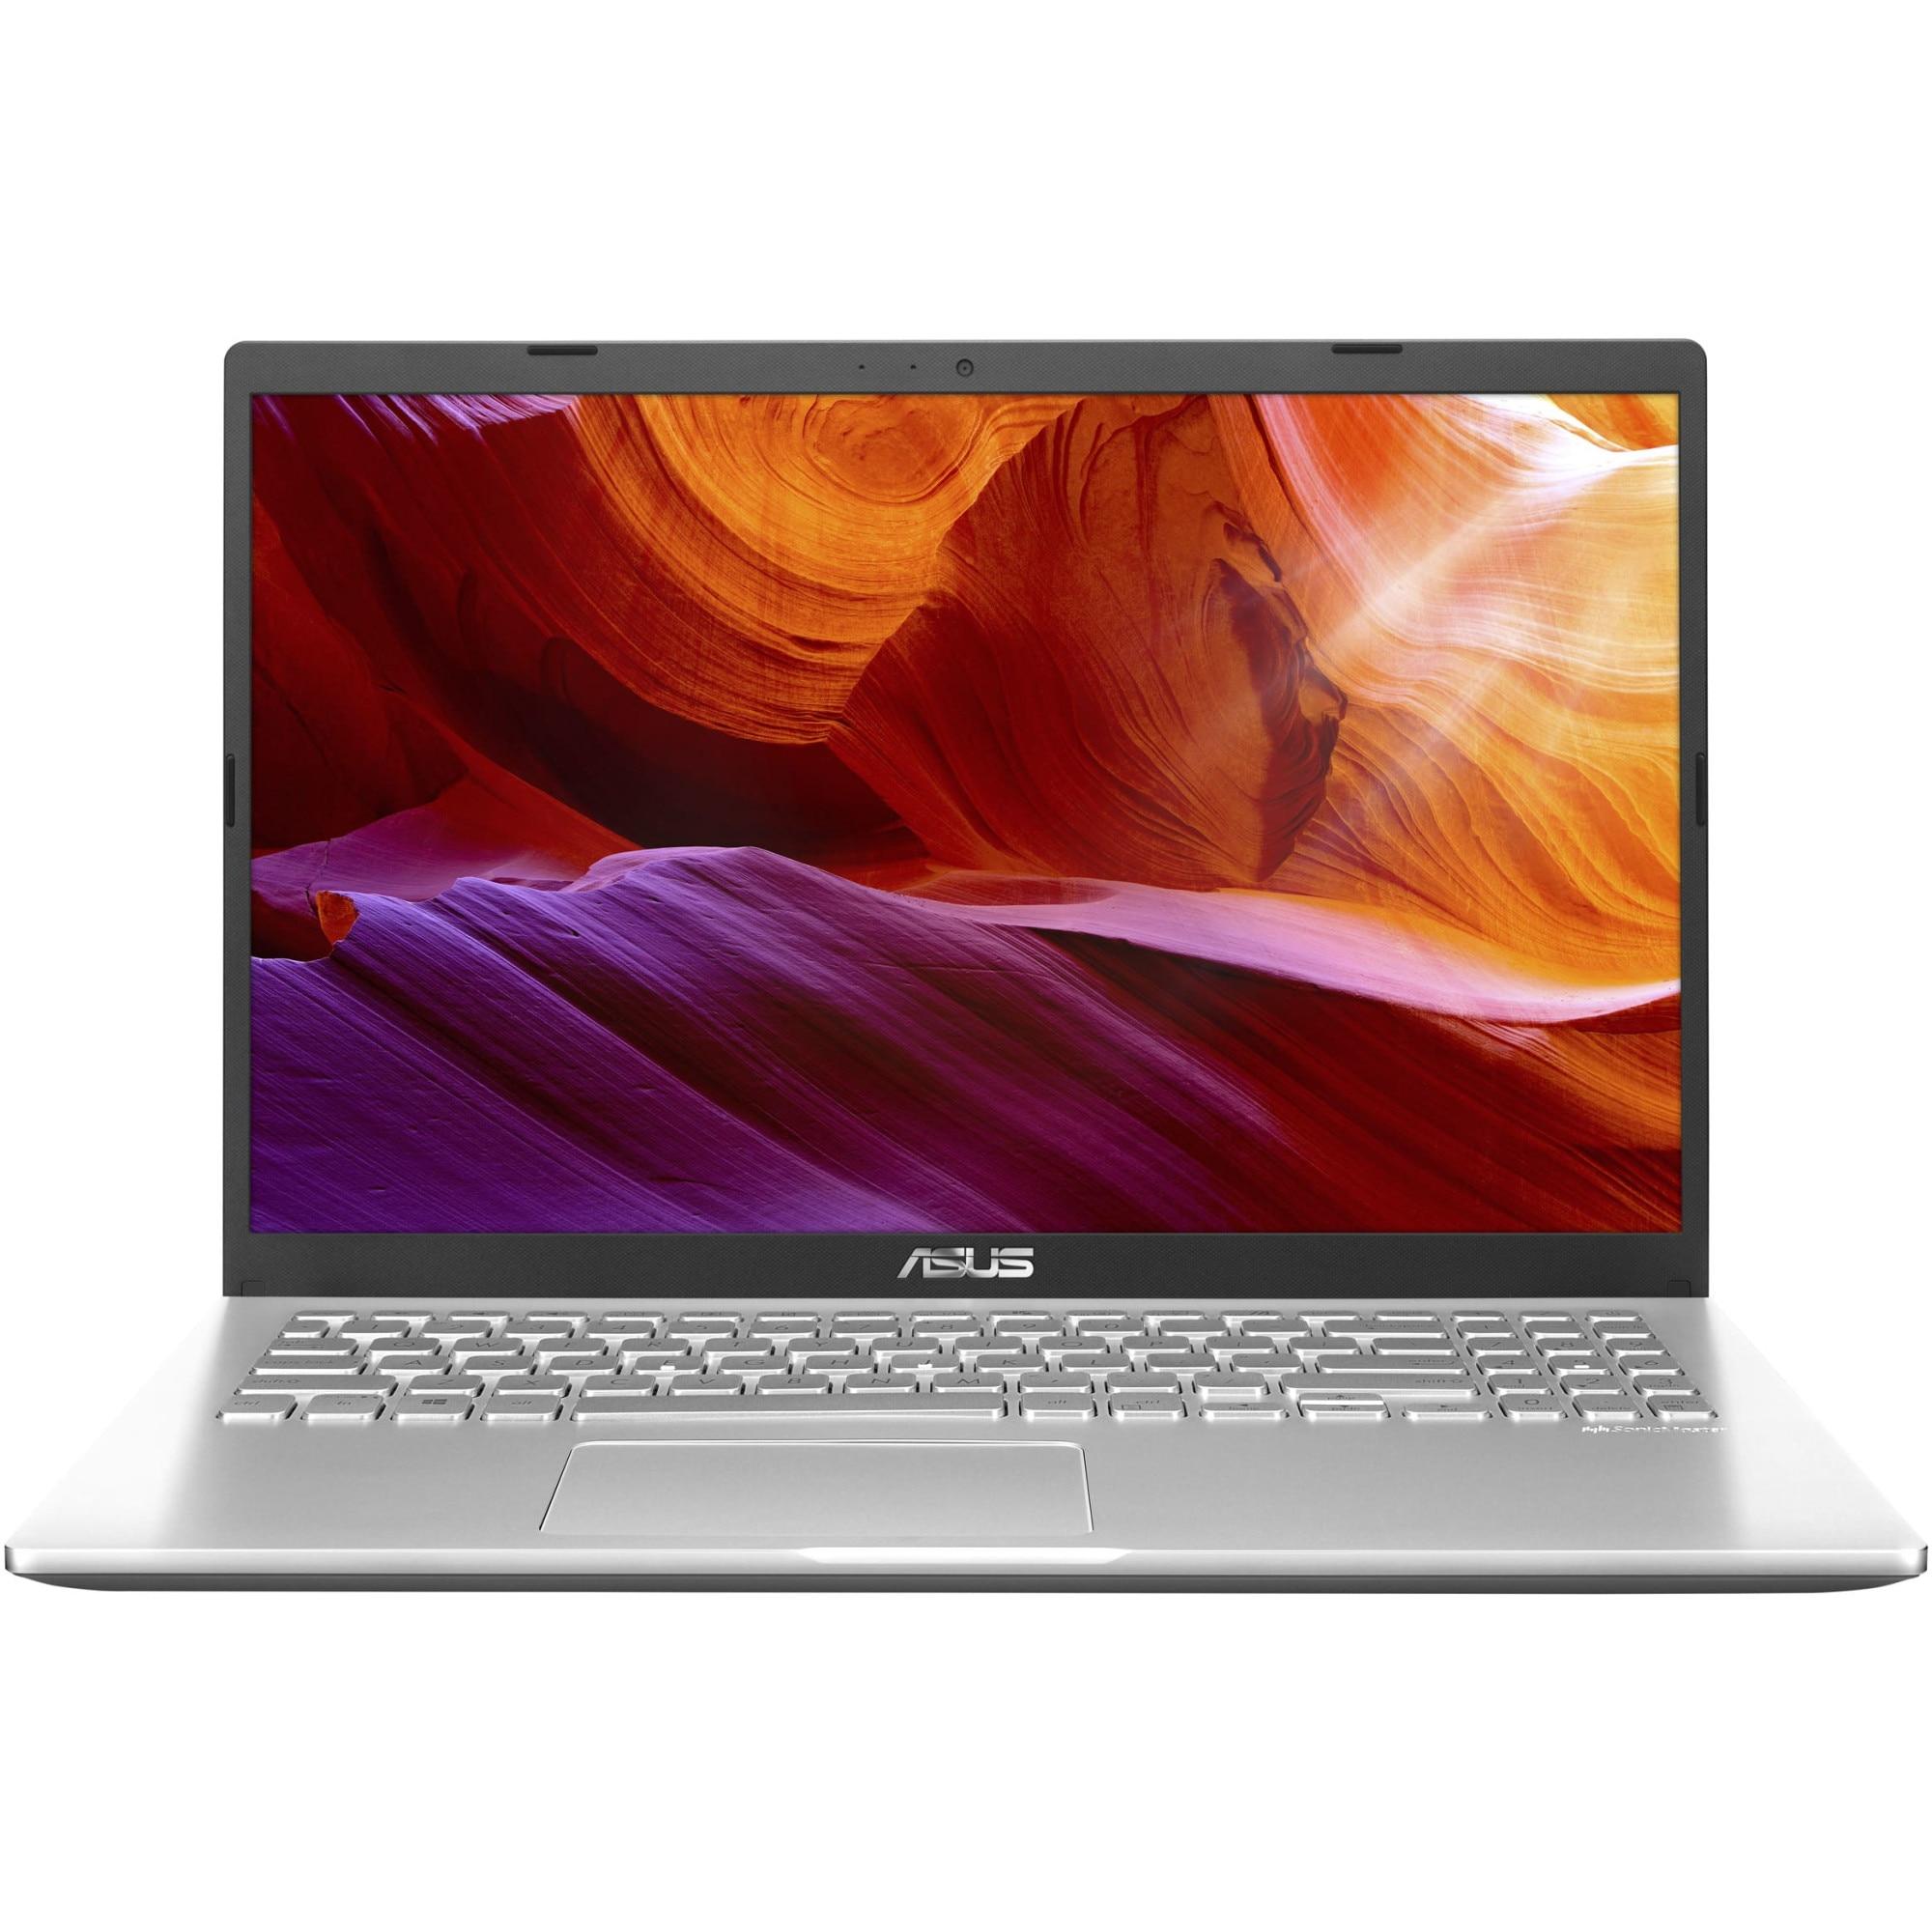 "Fotografie Laptop ASUS M509DA cu procesor AMD Ryzen™ 3 3250U pana la 3.5GHz, 15.6"" Full HD, 4GB, 256GB SSD, AMD Radeon™ Graphics, Free DOS, Transparent Silver"